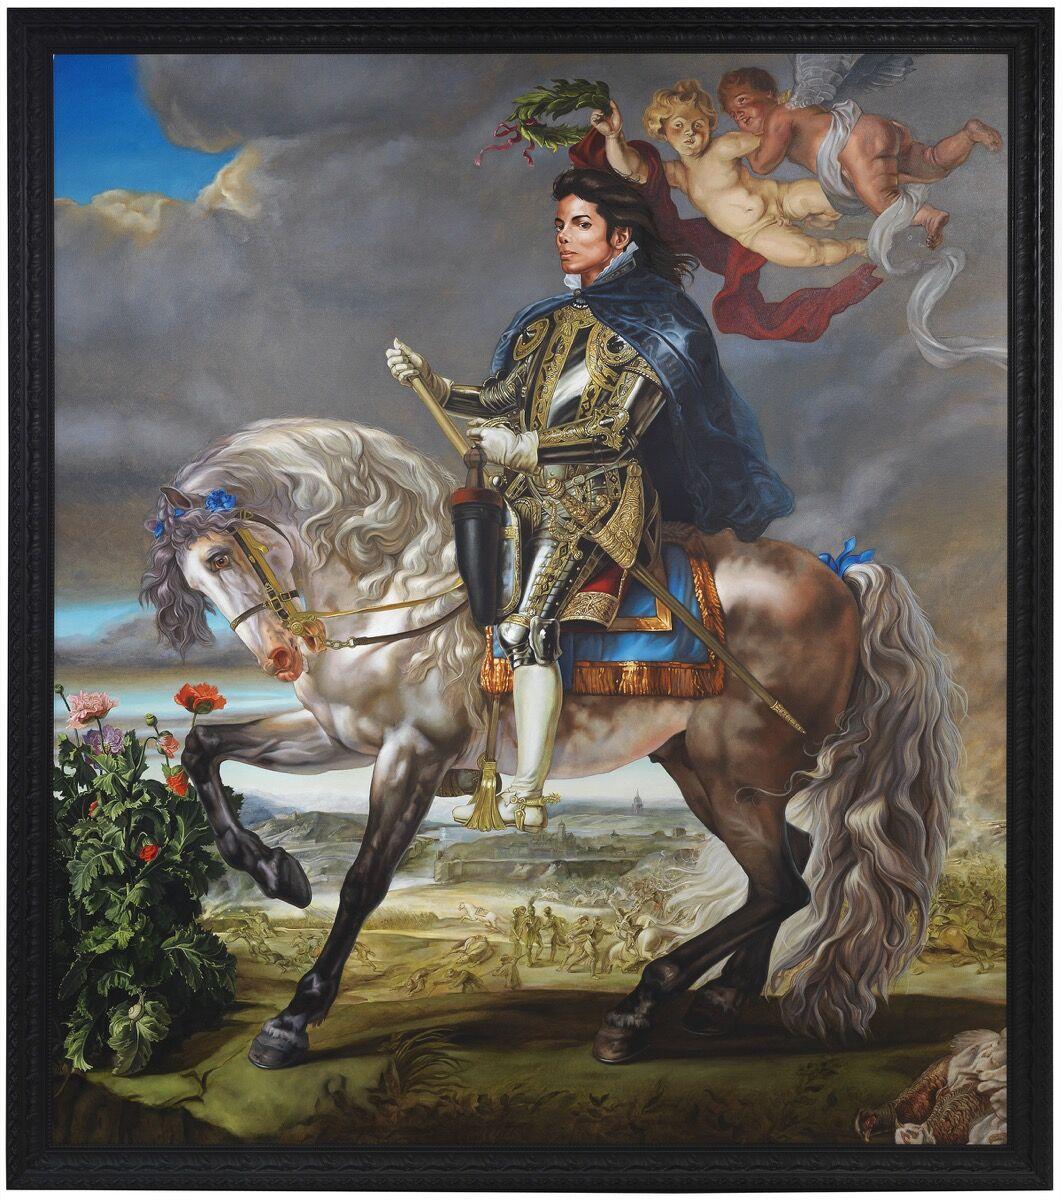 Kehinde Wiley, Equestrian Portrait of King Philip II (Michael Jackson), 2010. © Kehinde Wiley. Photo by Jeurg Iseler. Courtesy of Stephen Friedman Gallery, London and Sean Kelly Gallery, New York.